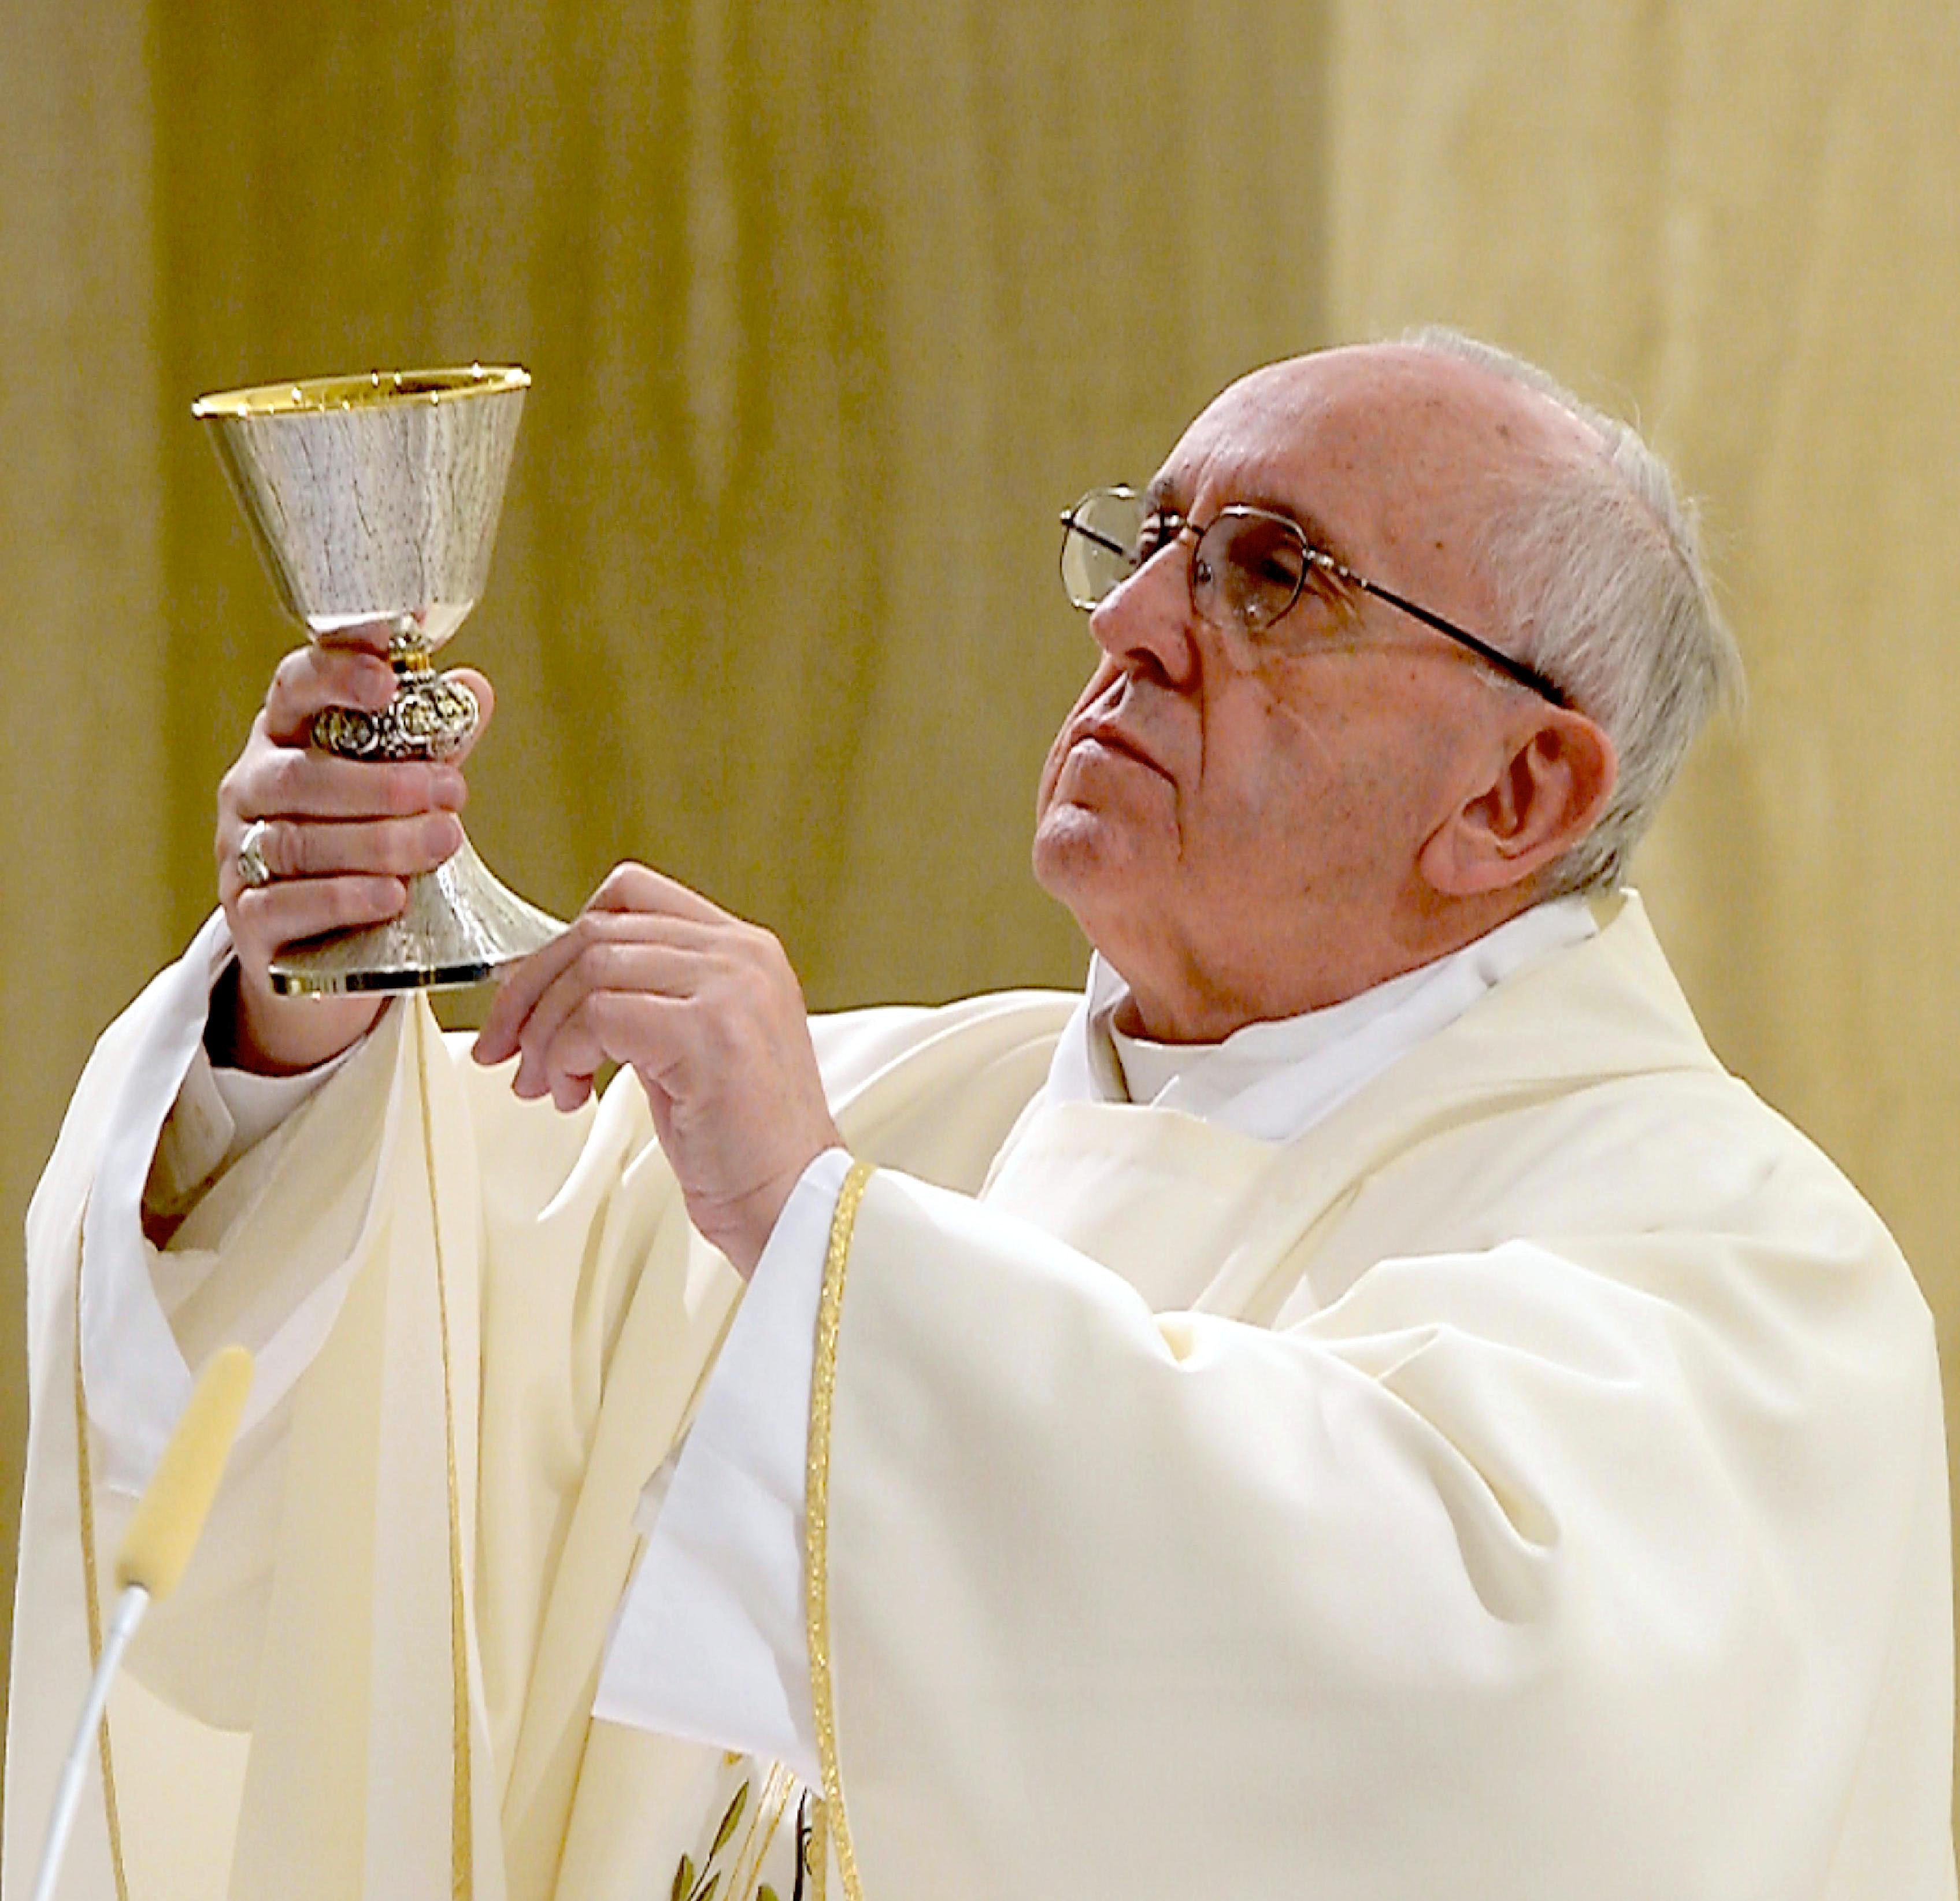 Il papa Francesco in Santa Marta 01-02-2016